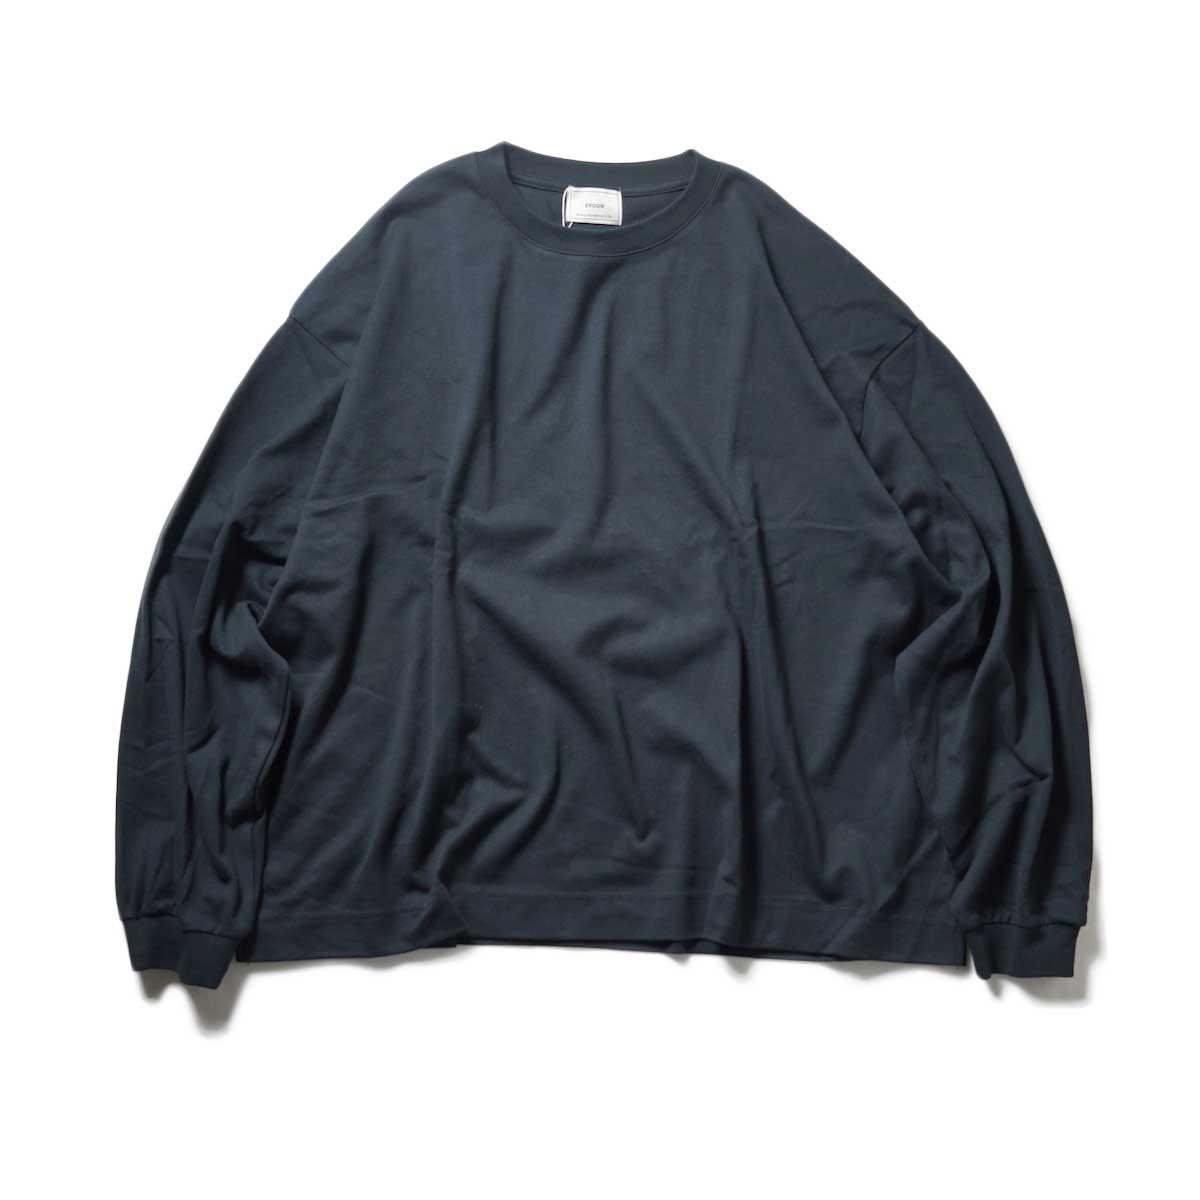 EVCON / WIDE L/S T-Shirt (Black)